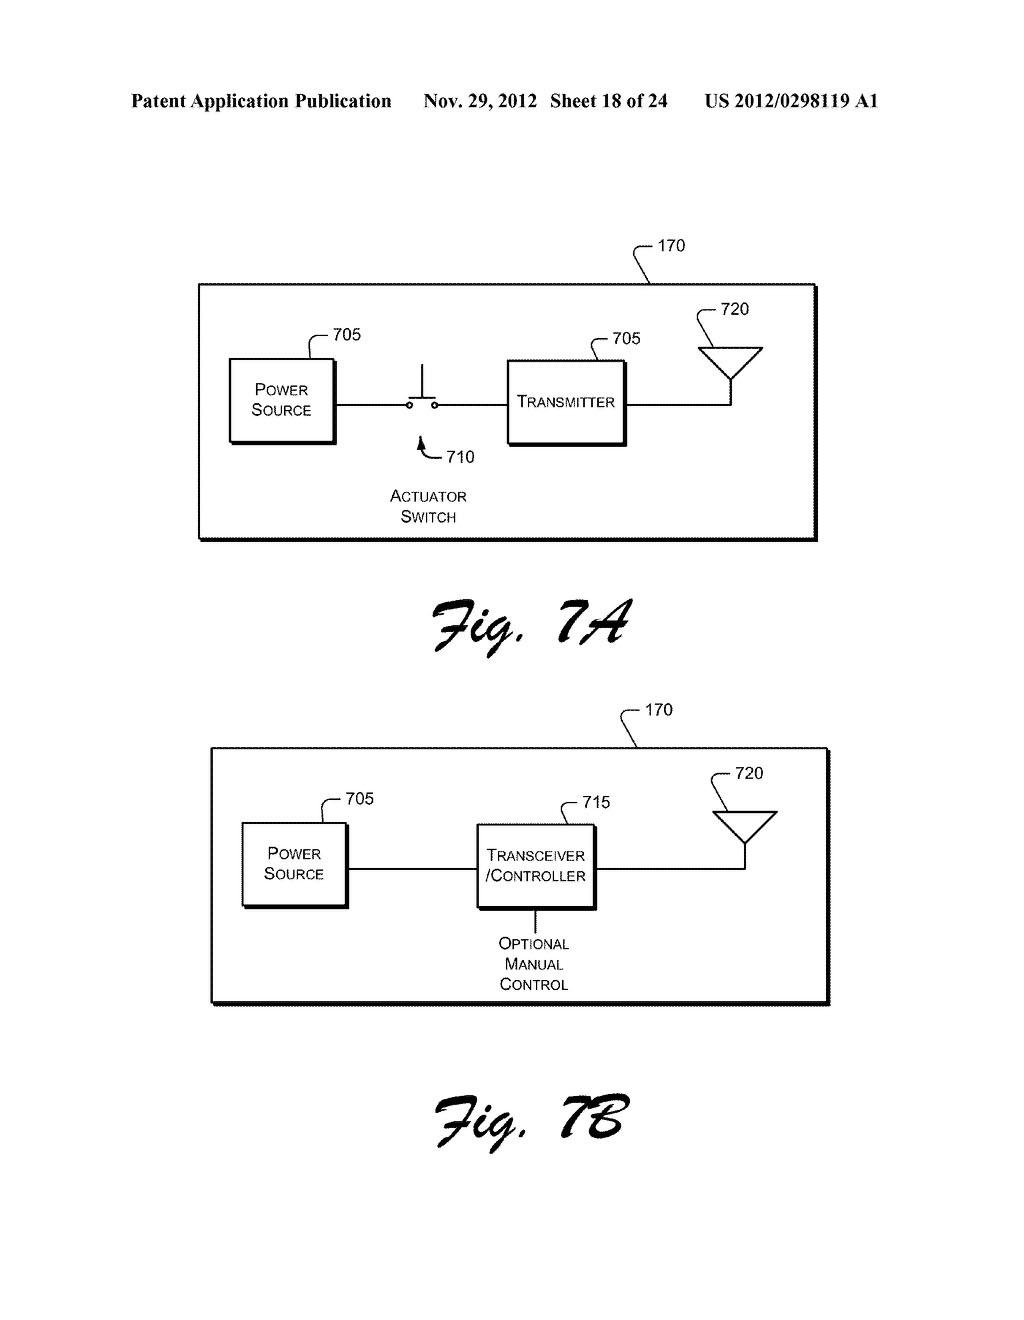 Cruel Designs The Handcuffs Of Future Funambulist Magazine Plunger Additionally Remote Control Light Switch Circuit Further Patent19